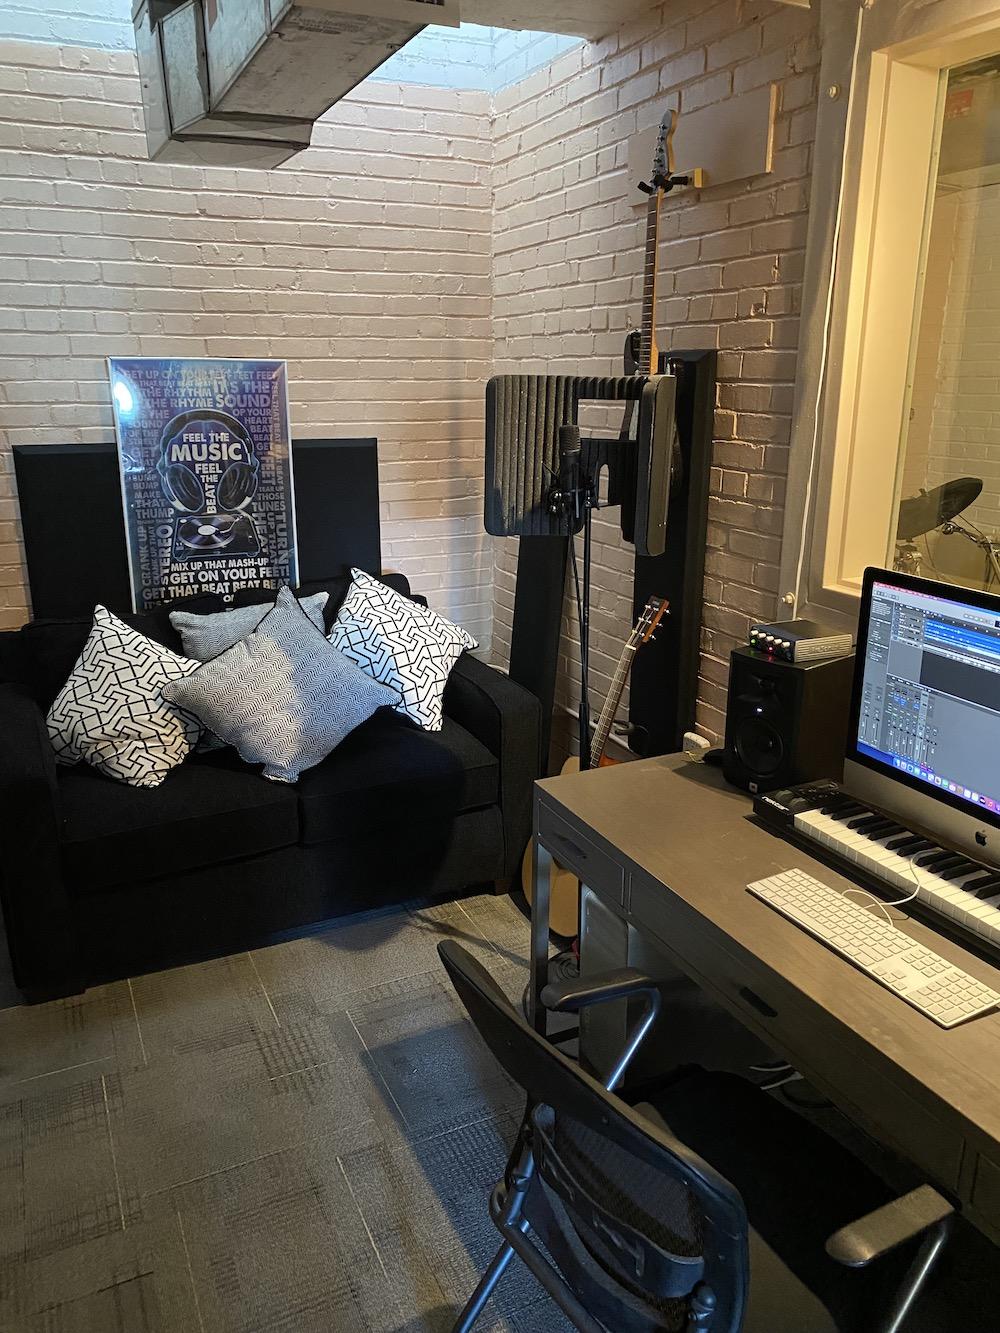 Urban Peak Shelter music studio